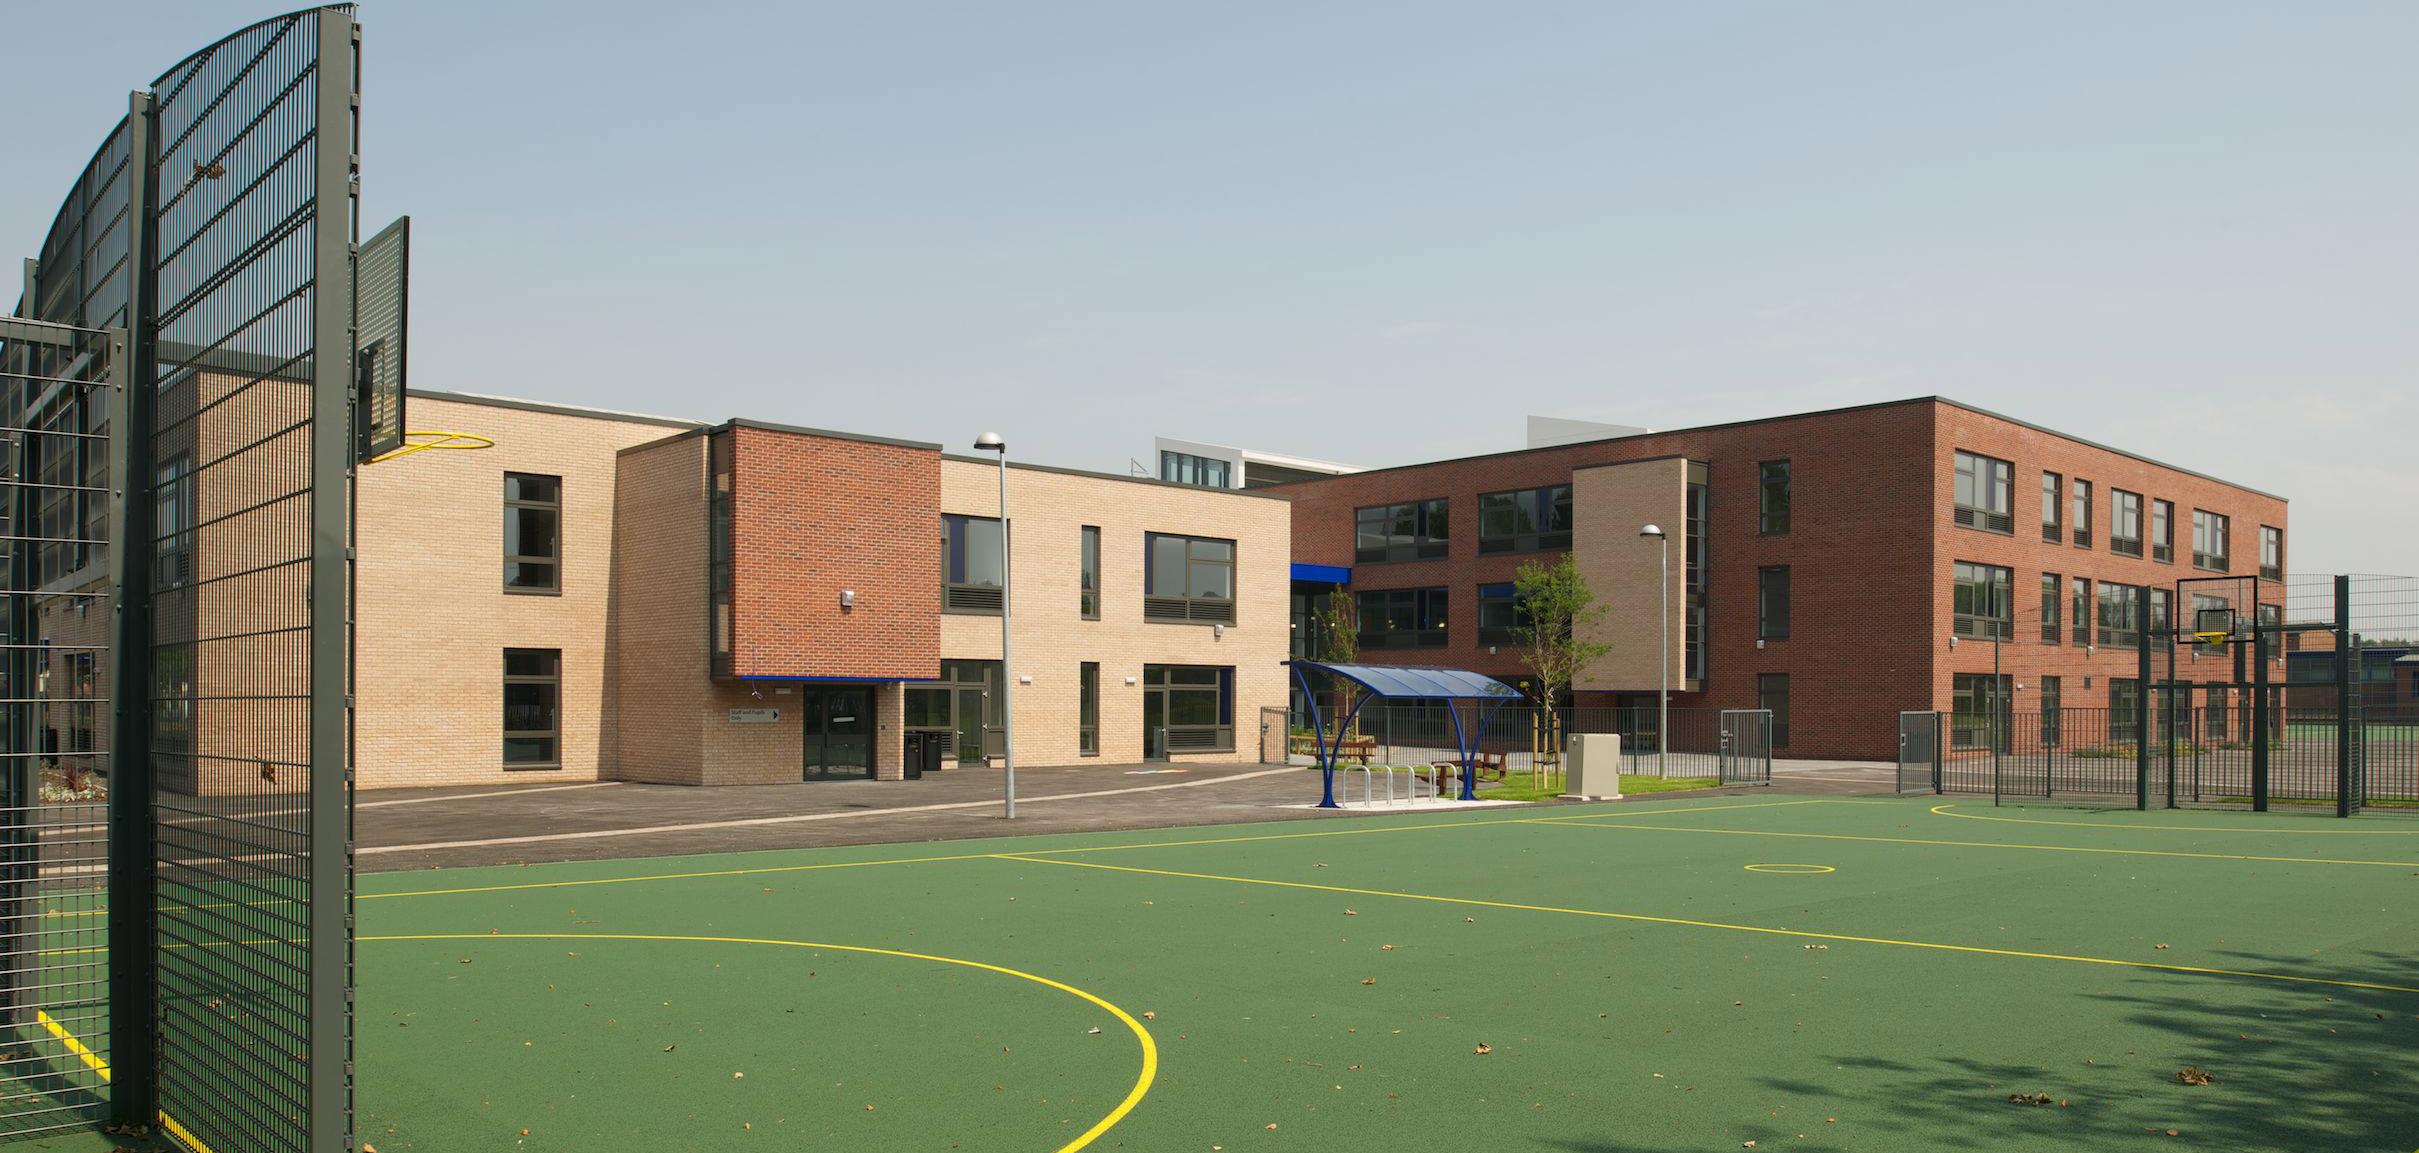 King David School, Liverpool